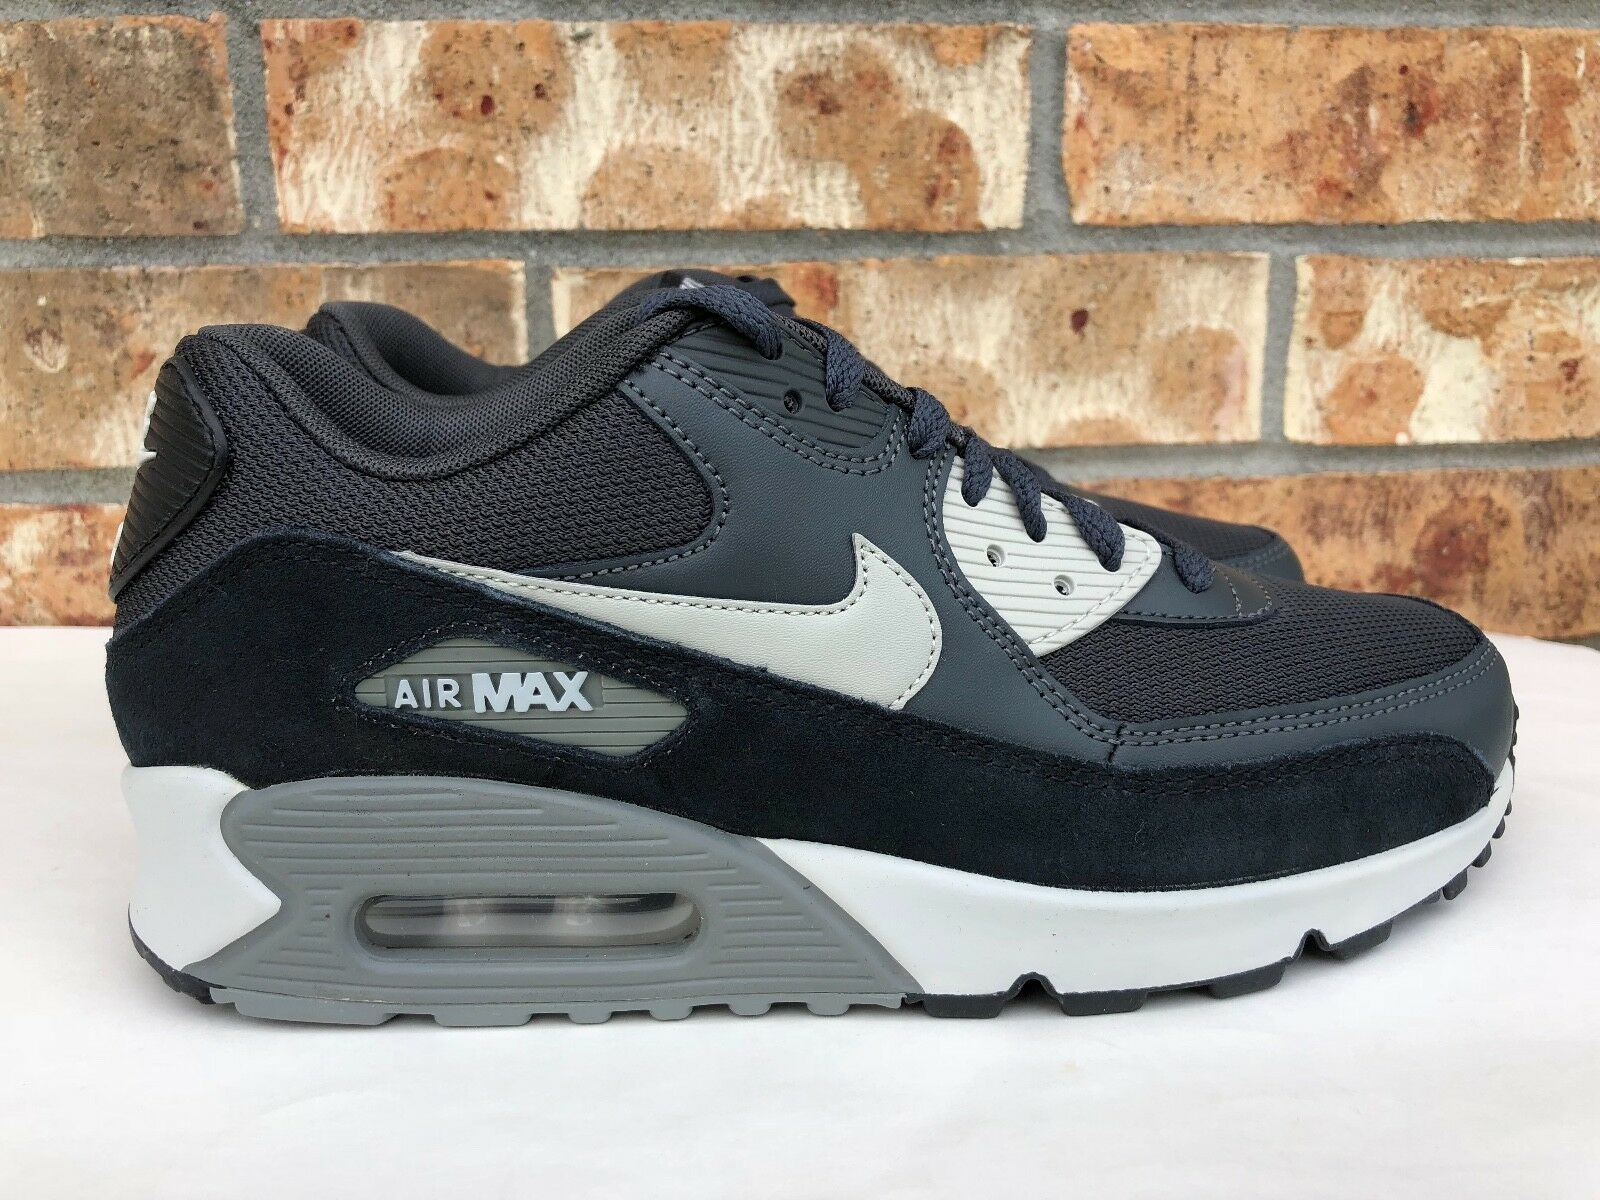 Hommes Nike Air Max 90 Noir Essential Athletic Anthracite Granite- Noir 90 537384-035 fcb5d8